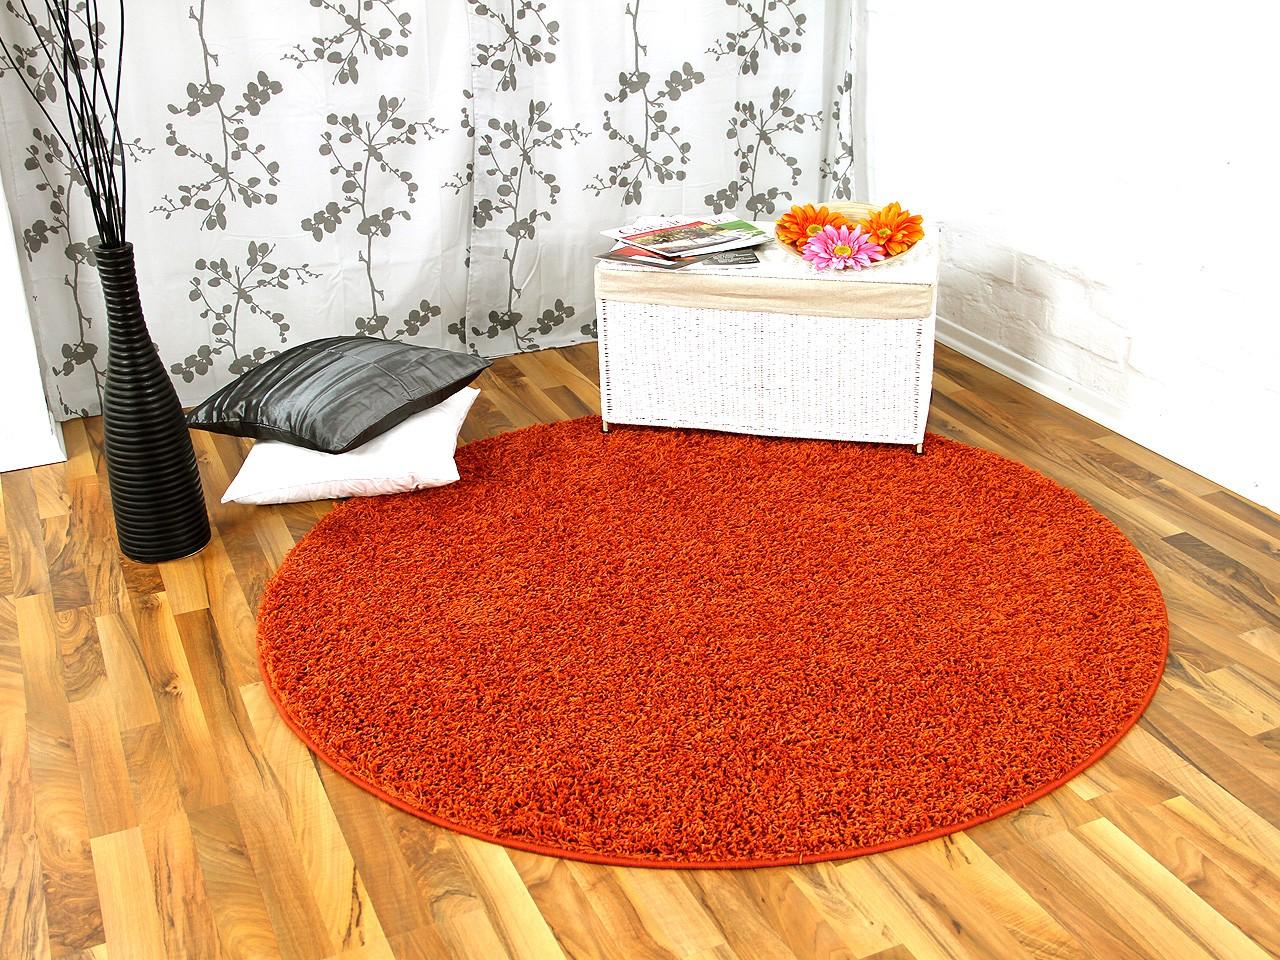 hochflor langflor teppich shaggy nova orange rund sonderaktion sonderposten hochflor langflor. Black Bedroom Furniture Sets. Home Design Ideas